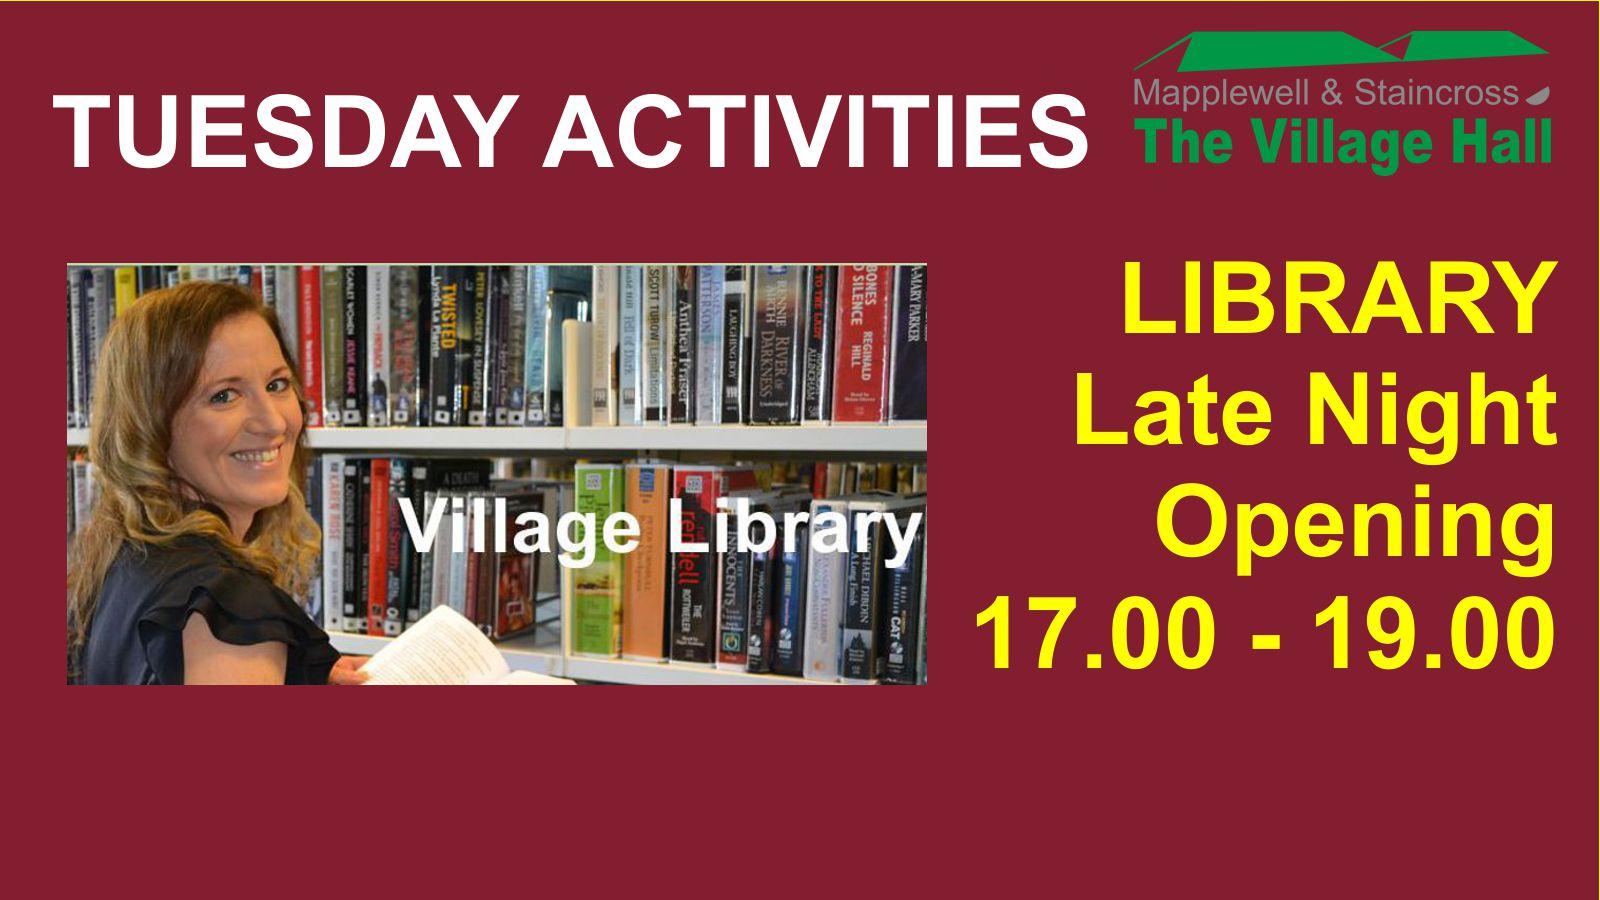 (C) Nick Hibberd - Library